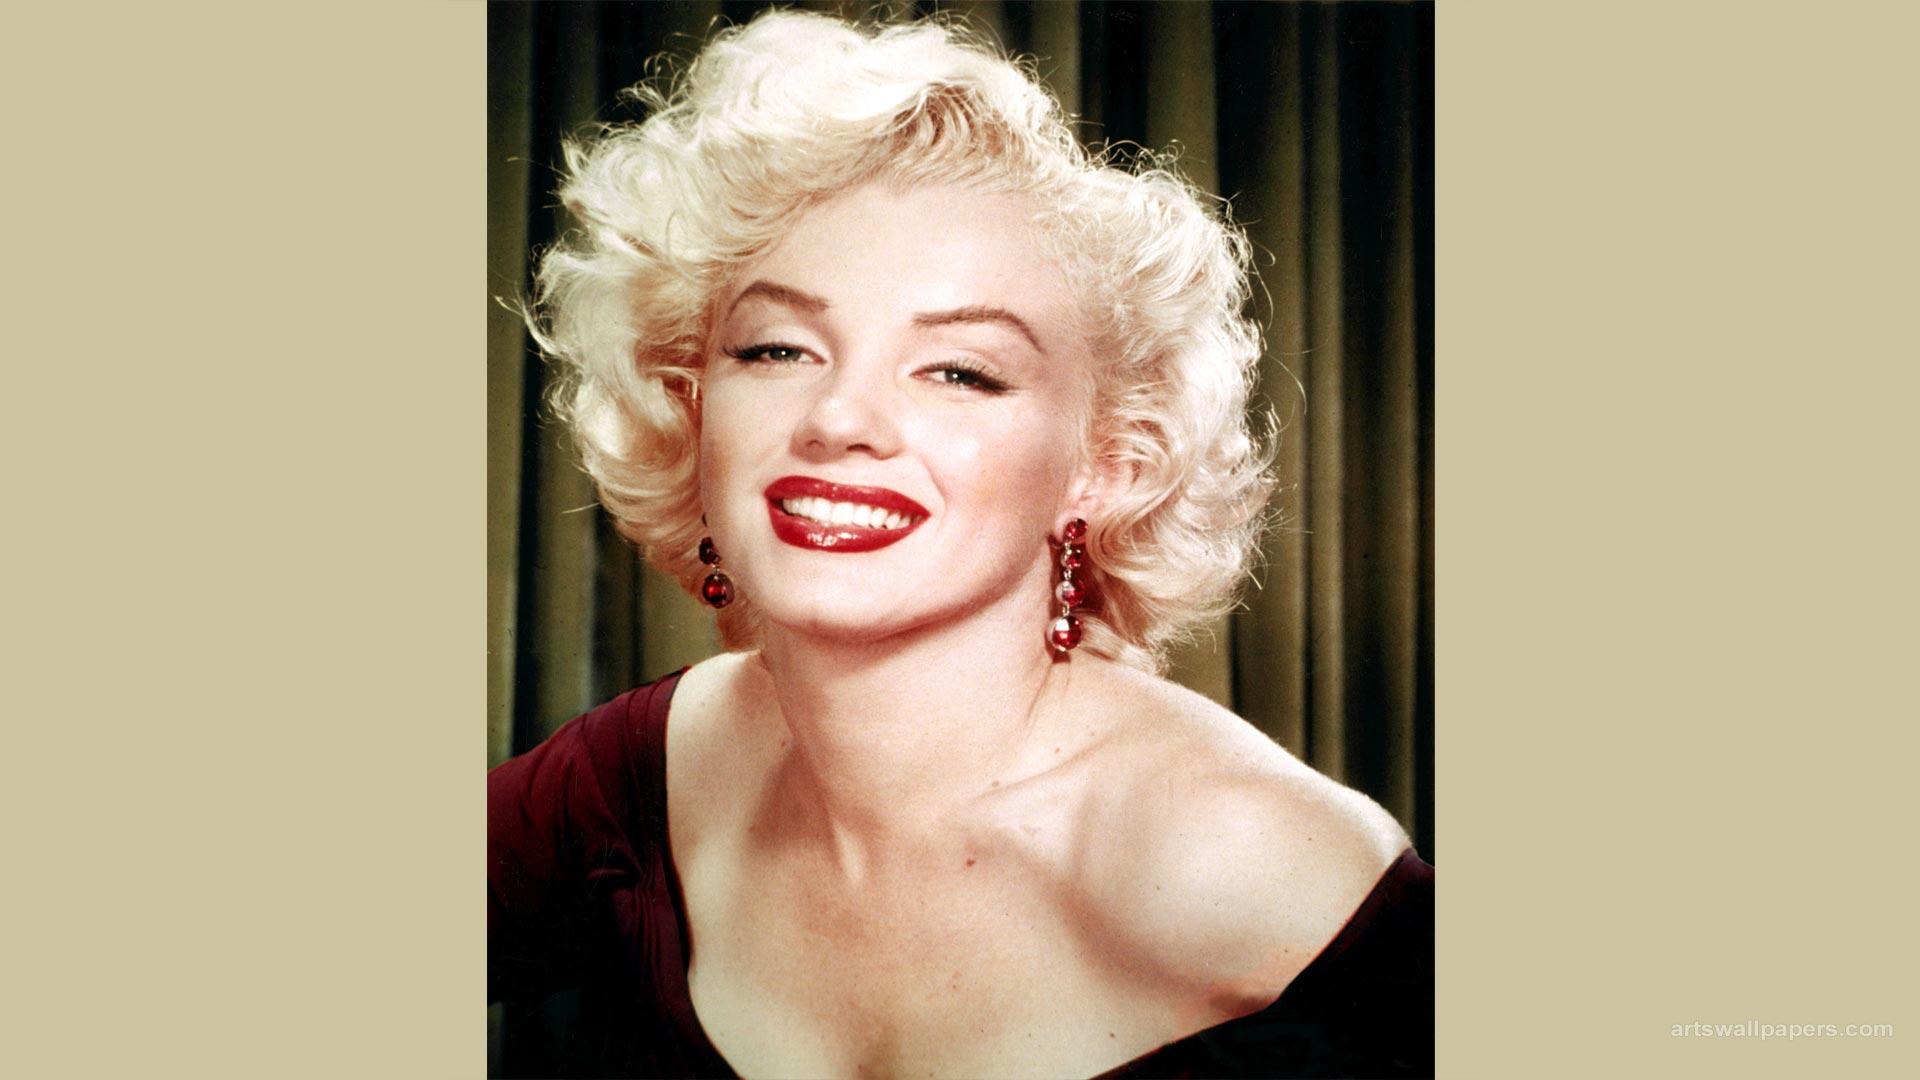 46 Marilyn Monroe Live Wallpaper On Wallpapersafari